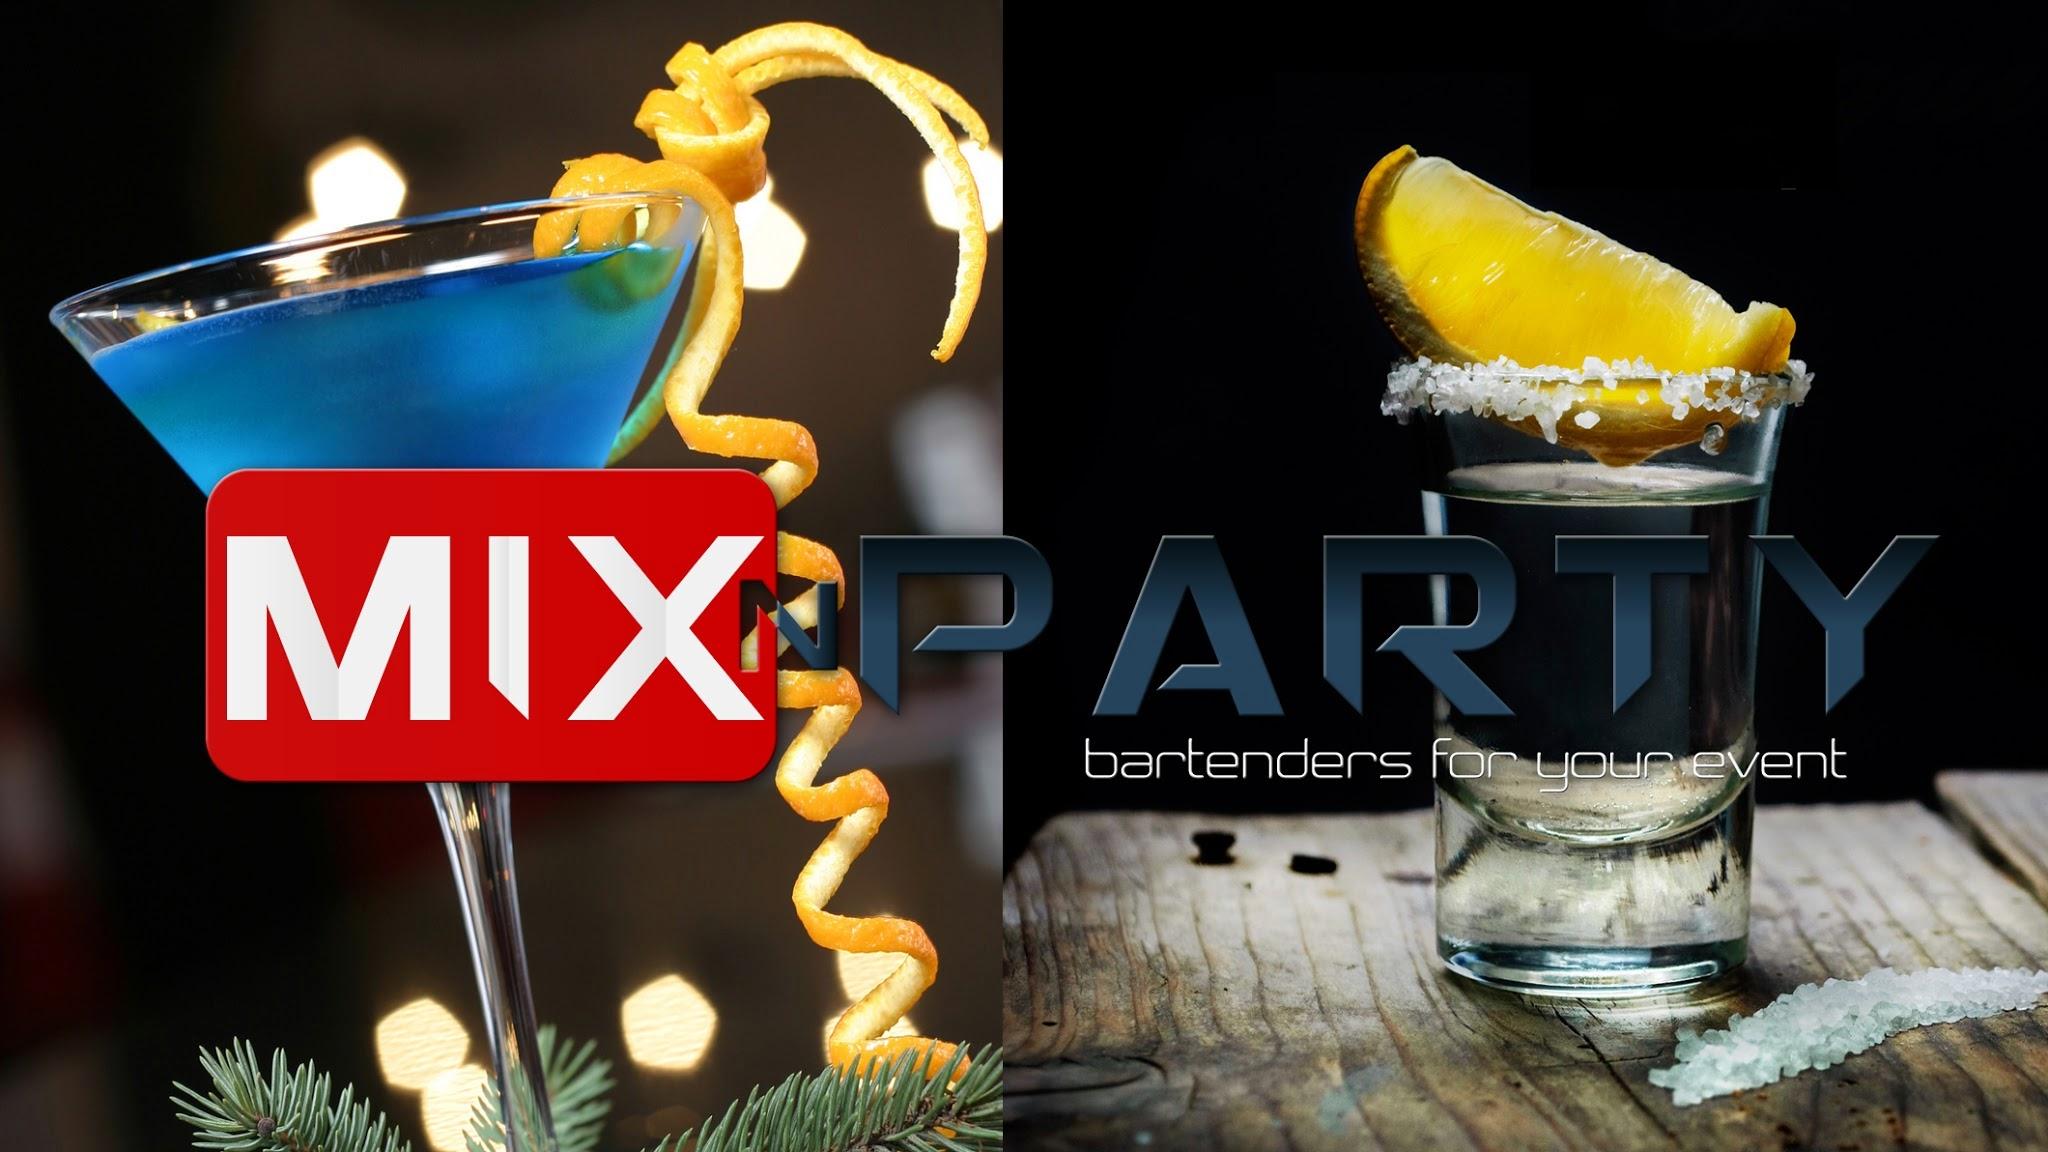 Flair Bartending Wallpaper Mix n party bartenders -